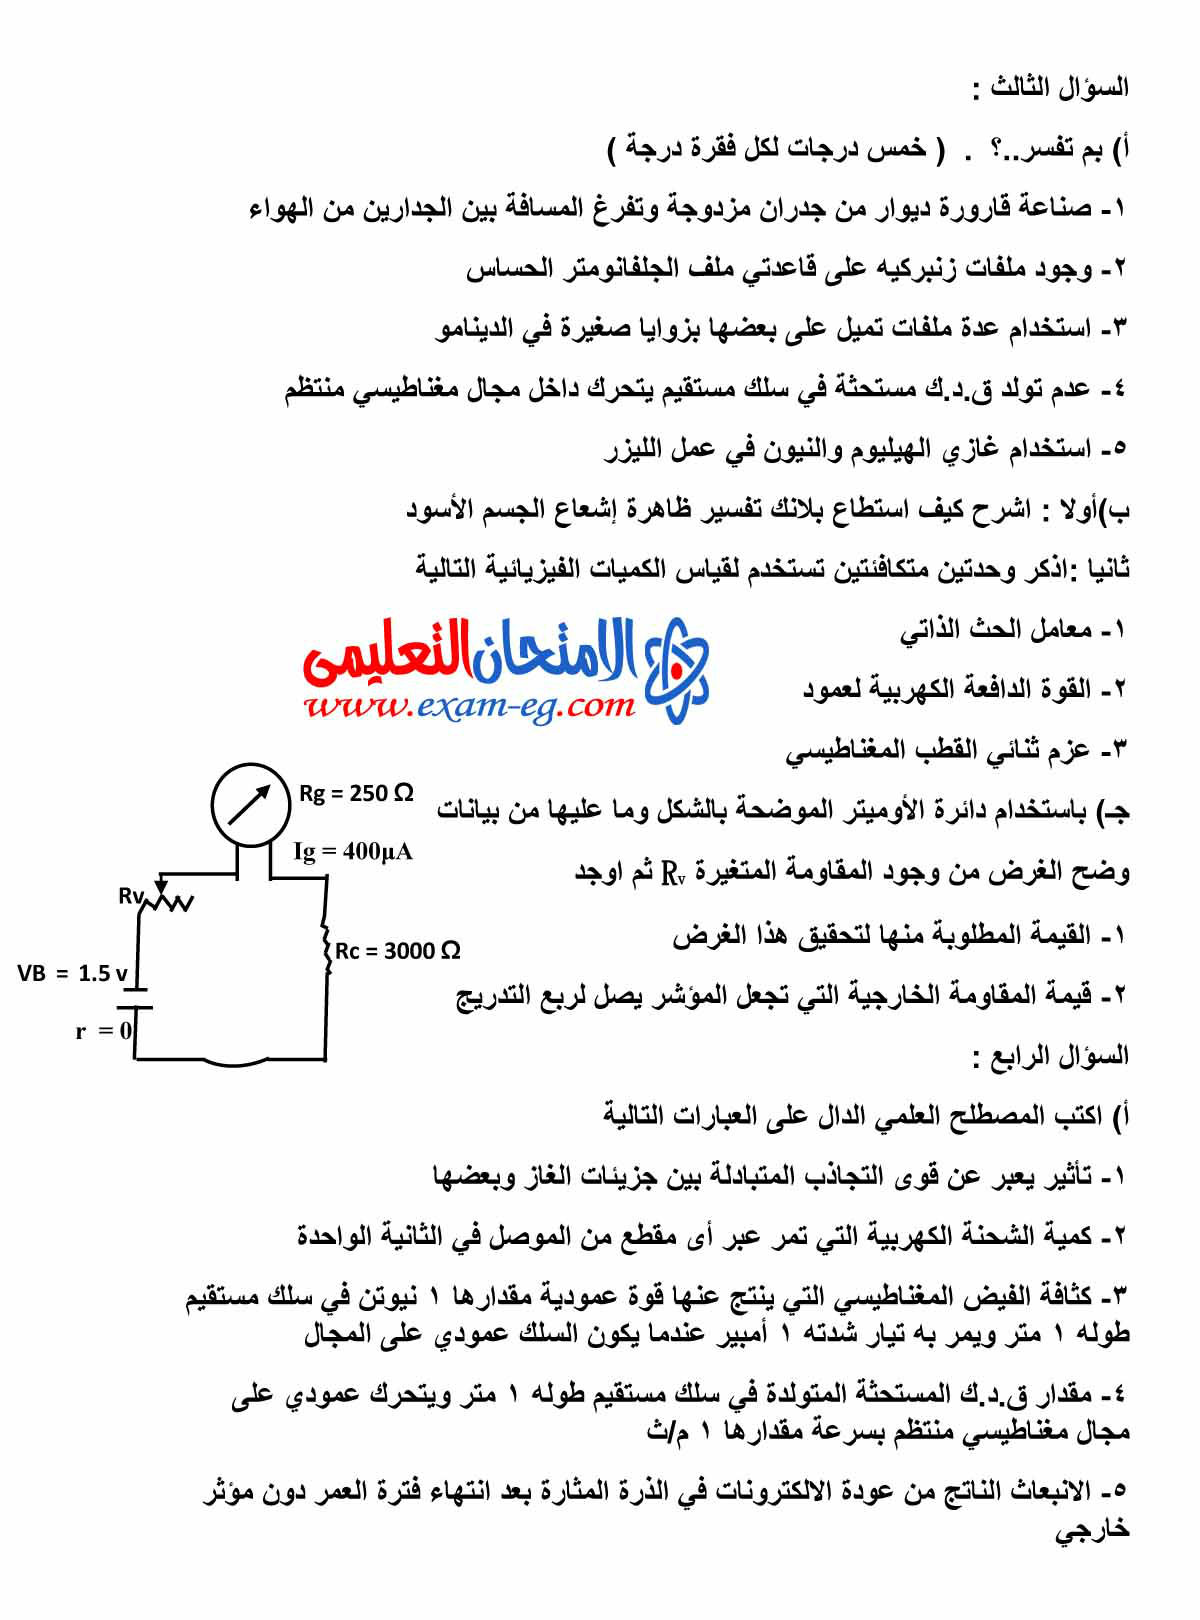 exam-eg.com_1403333913013.jpg